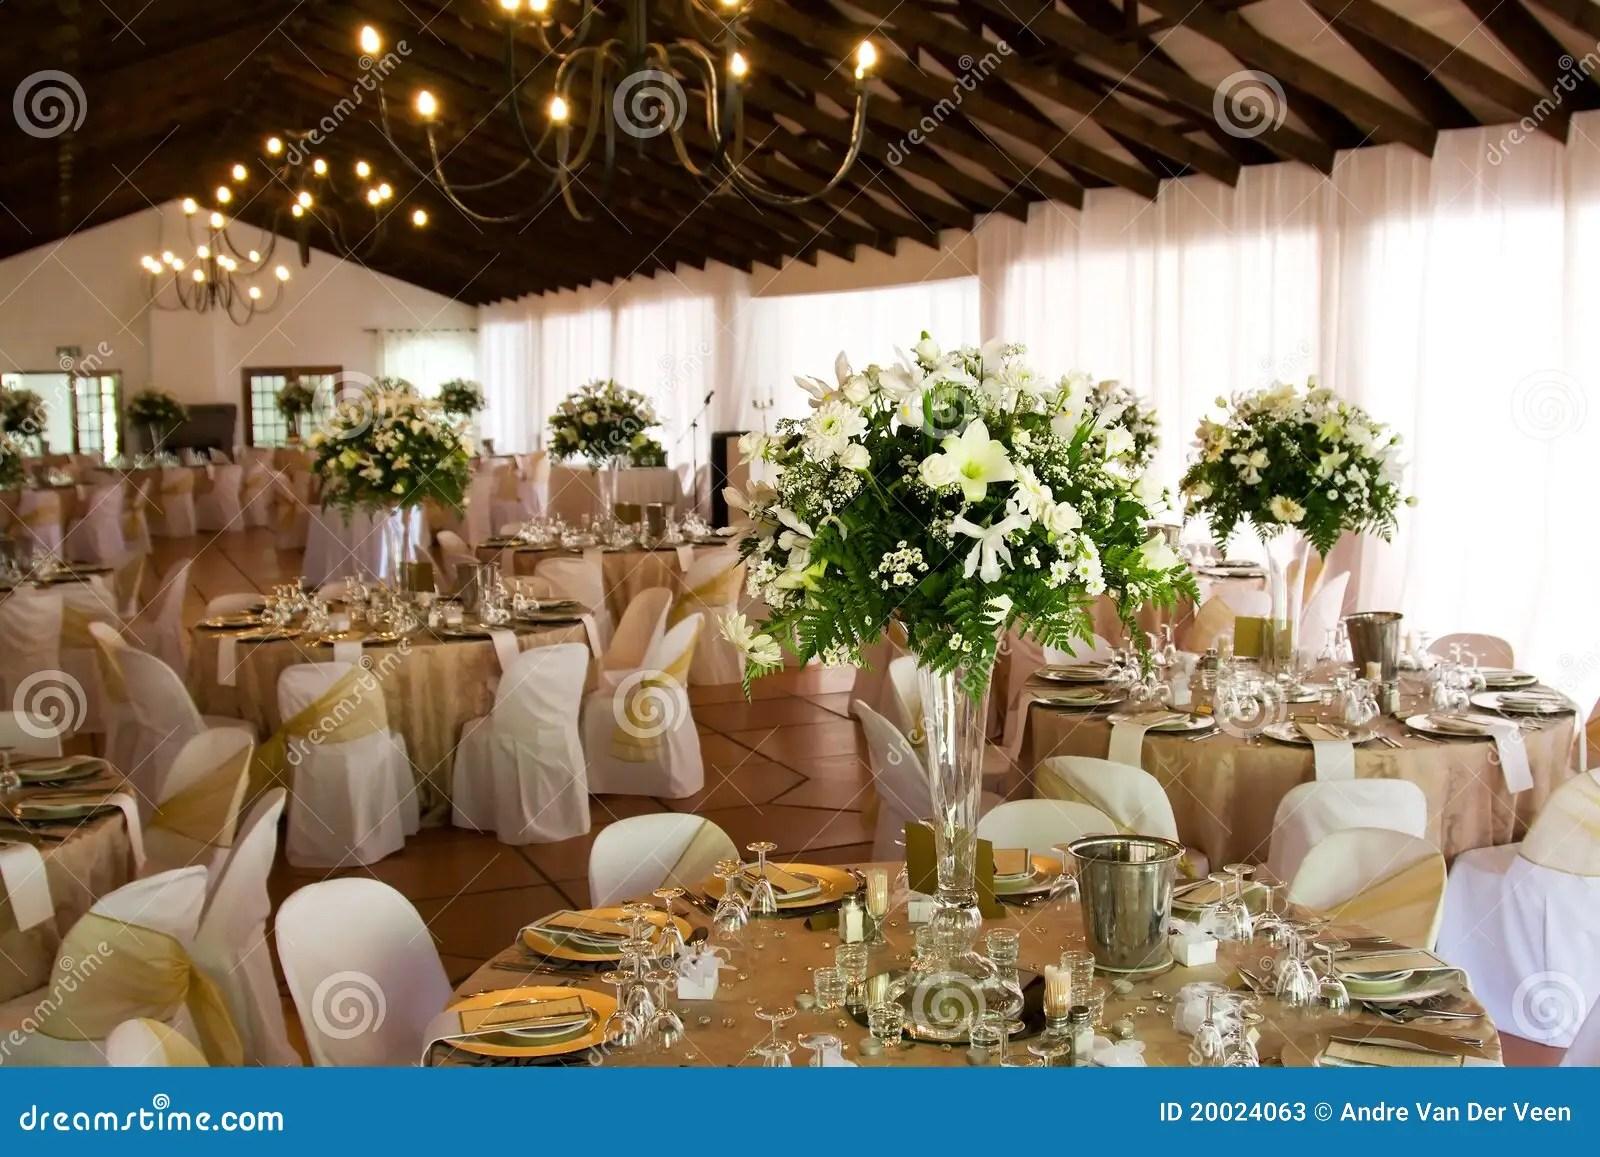 stock photo wedding decor beautiful hindu mandap image wedding decor Indoors wedding reception venue with decor Stock Photos